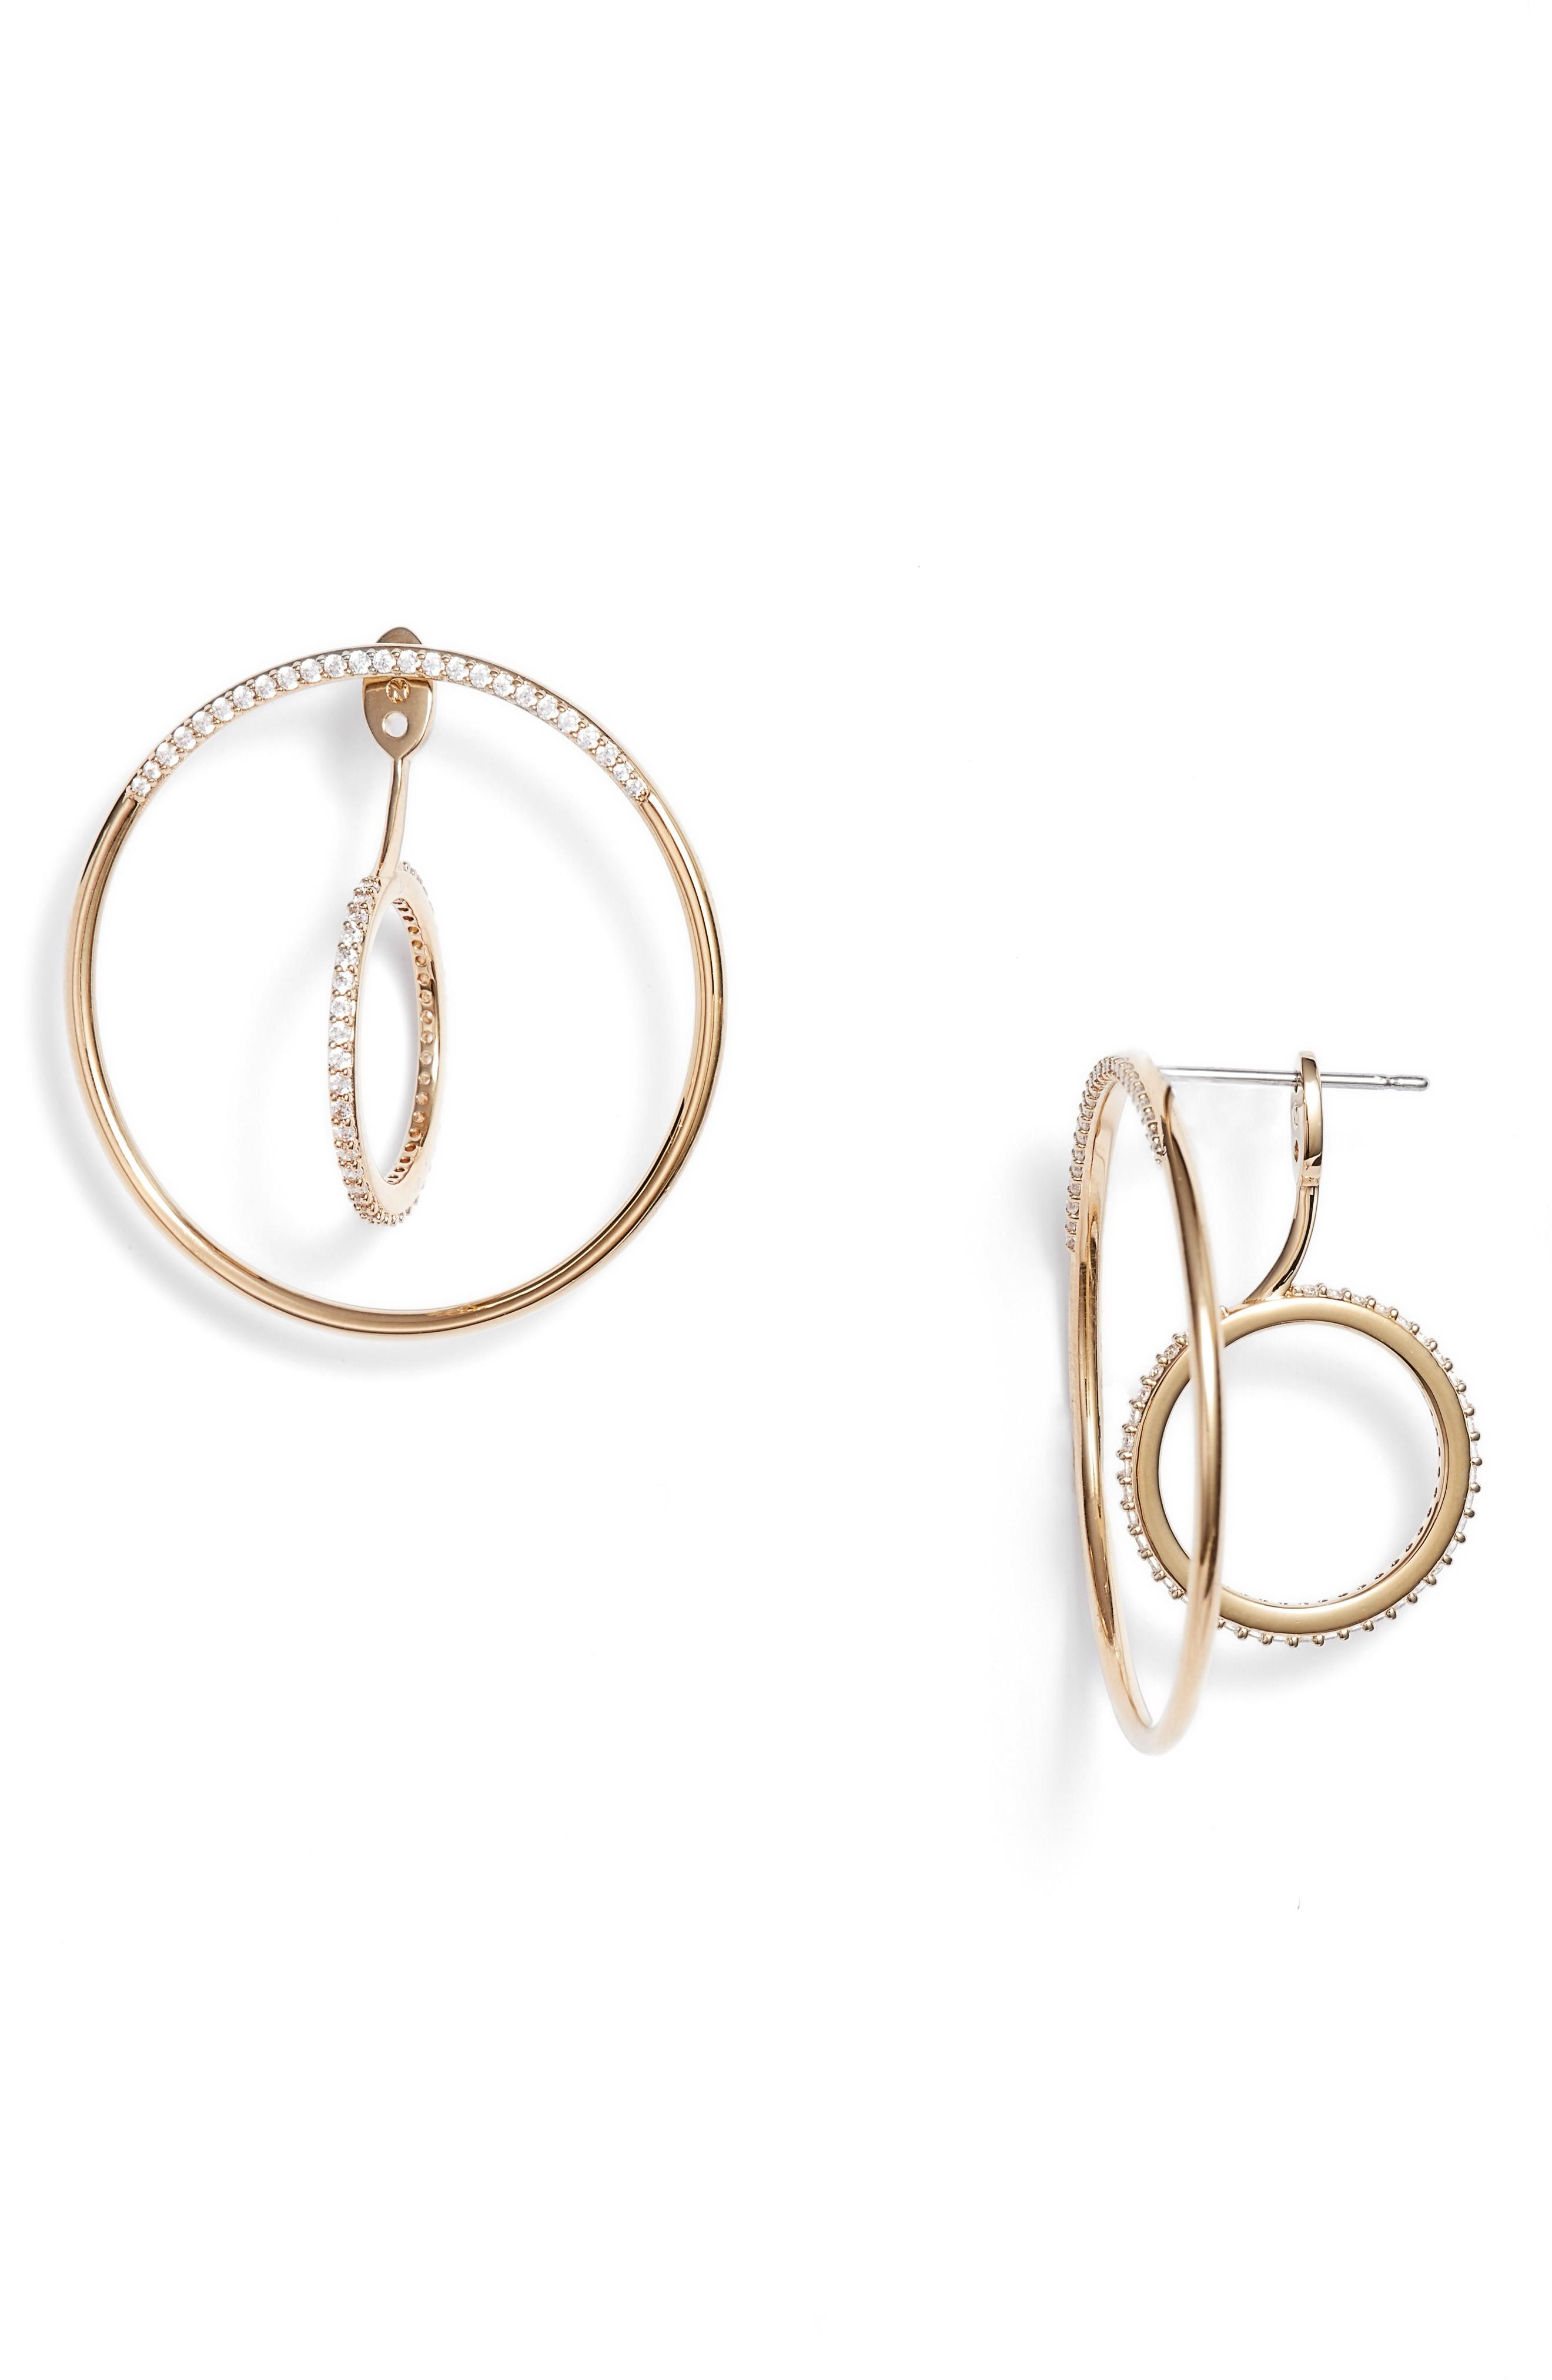 Nadri Intersecting Hoop Ear Jackets In Gold/ Clear